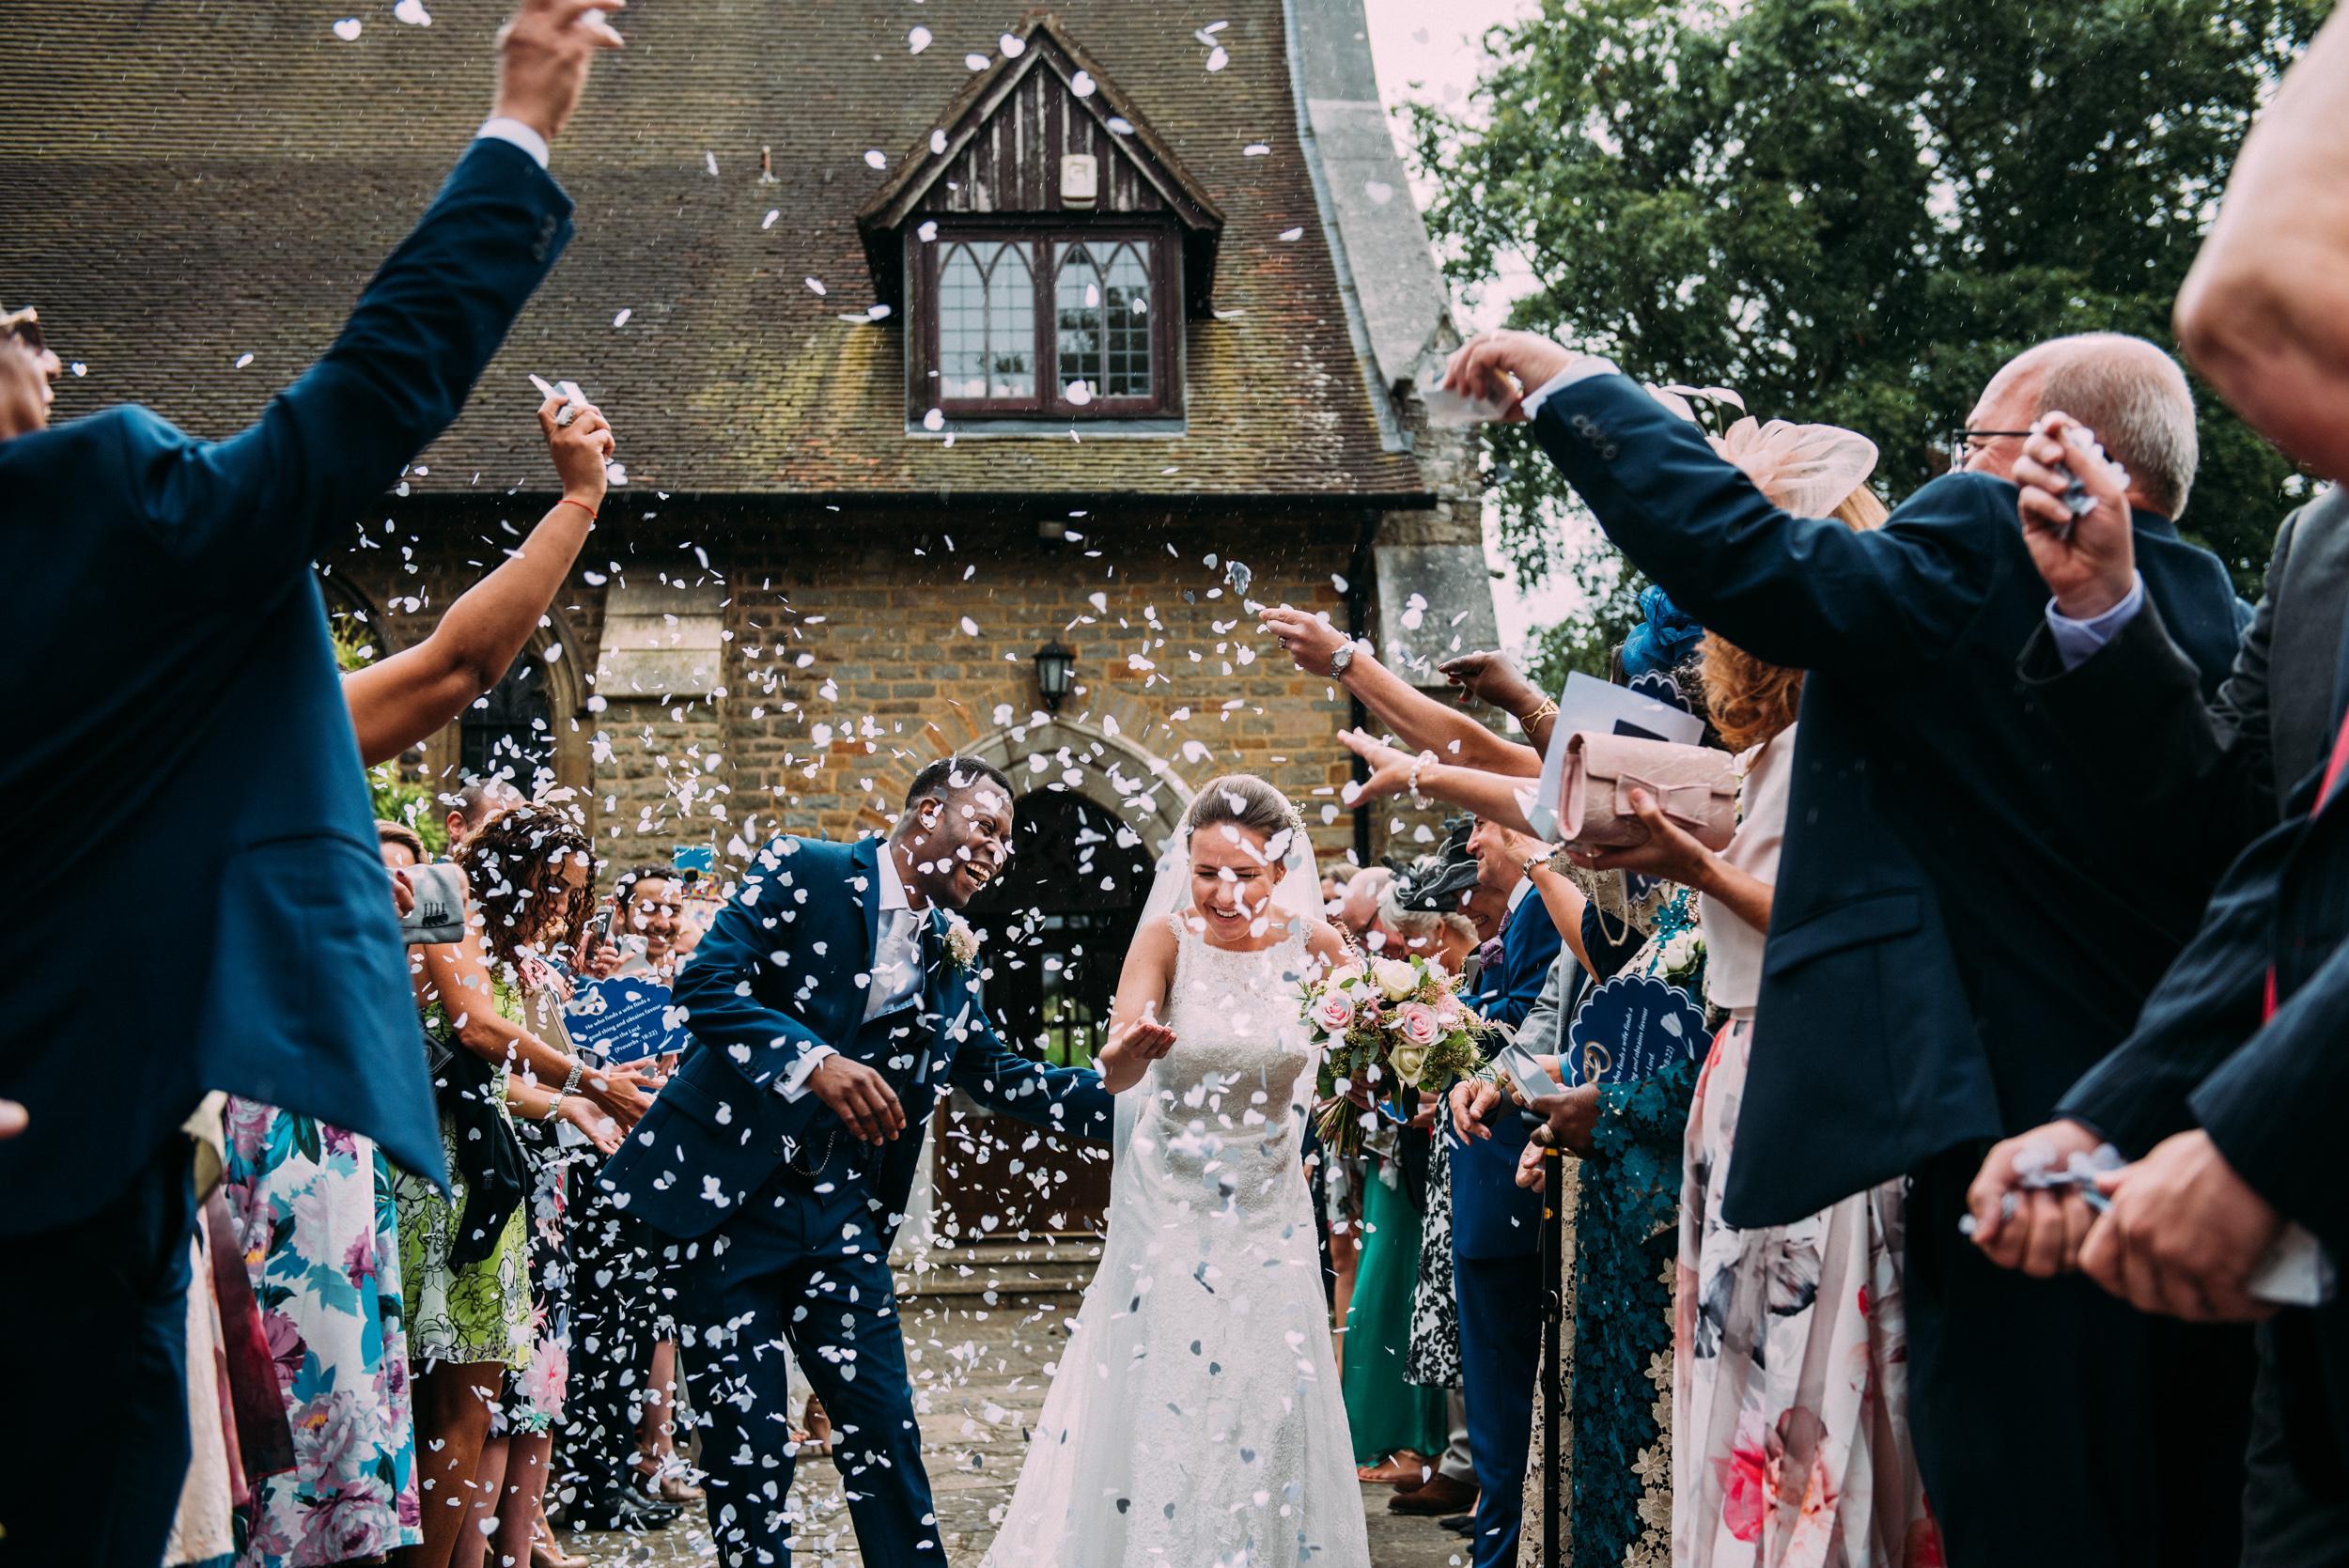 David Scholes Lancashire wedding photography 2016-156.jpg